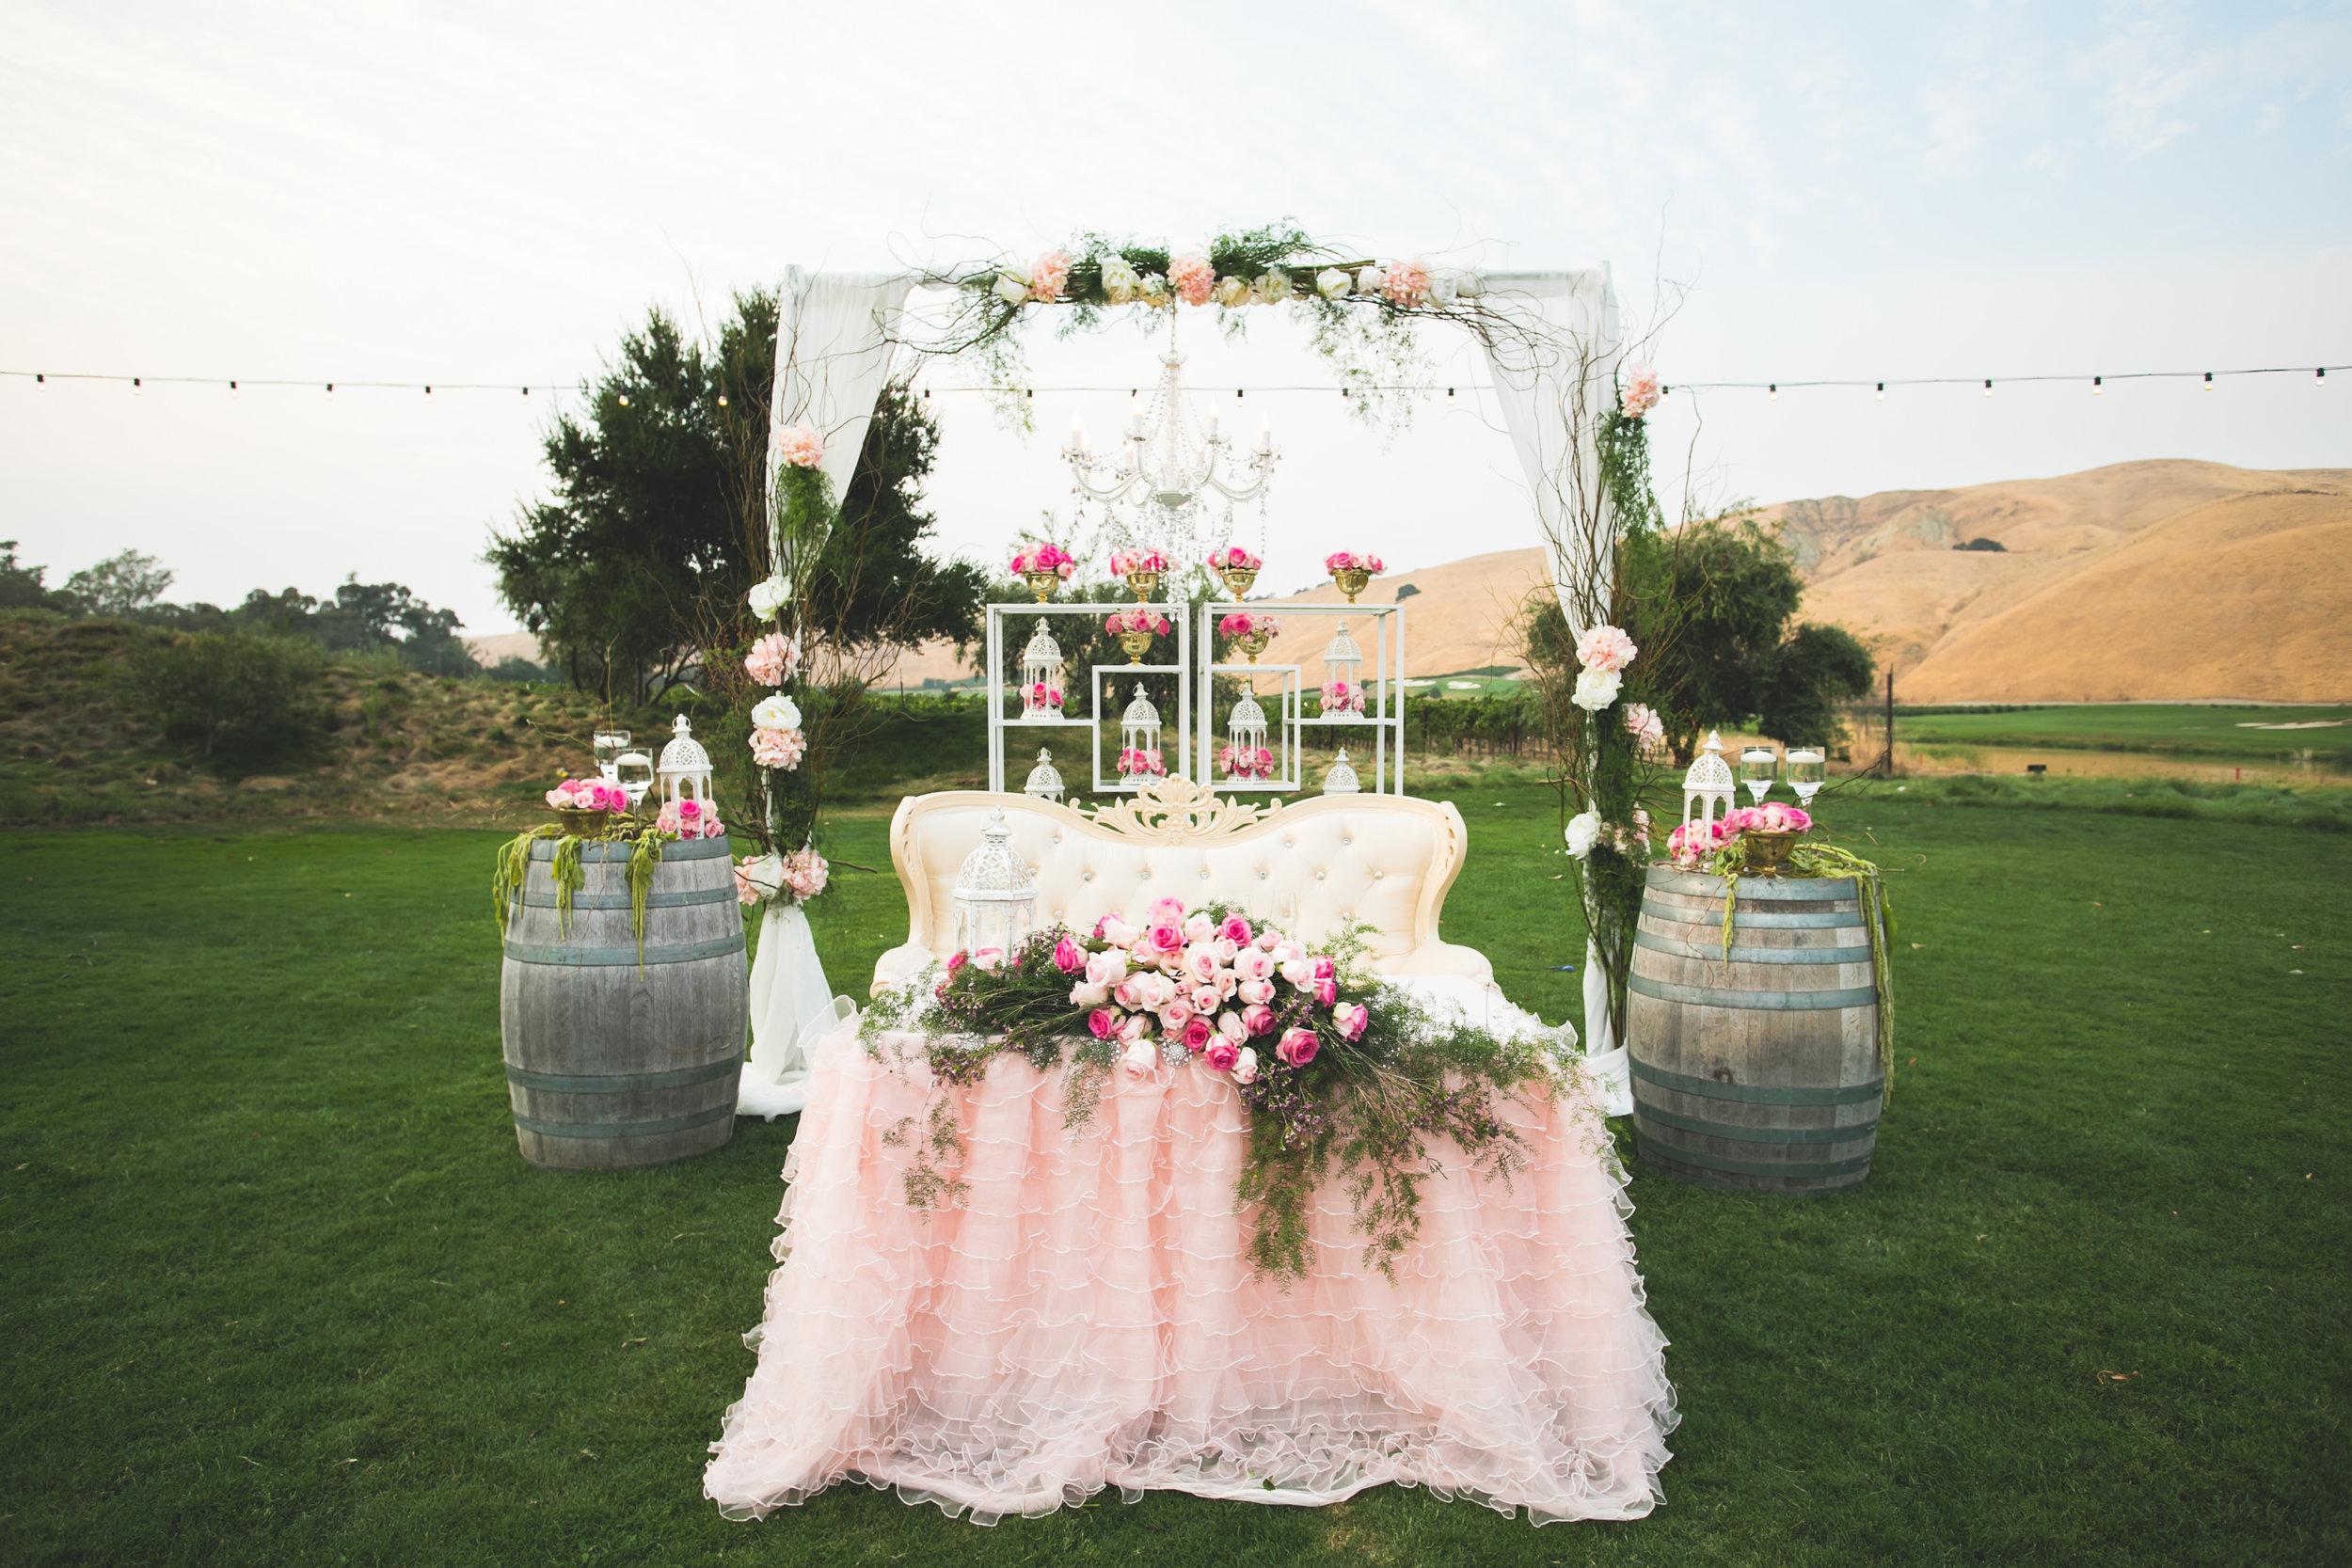 karina_asresh_wedding-0621-1.jpg